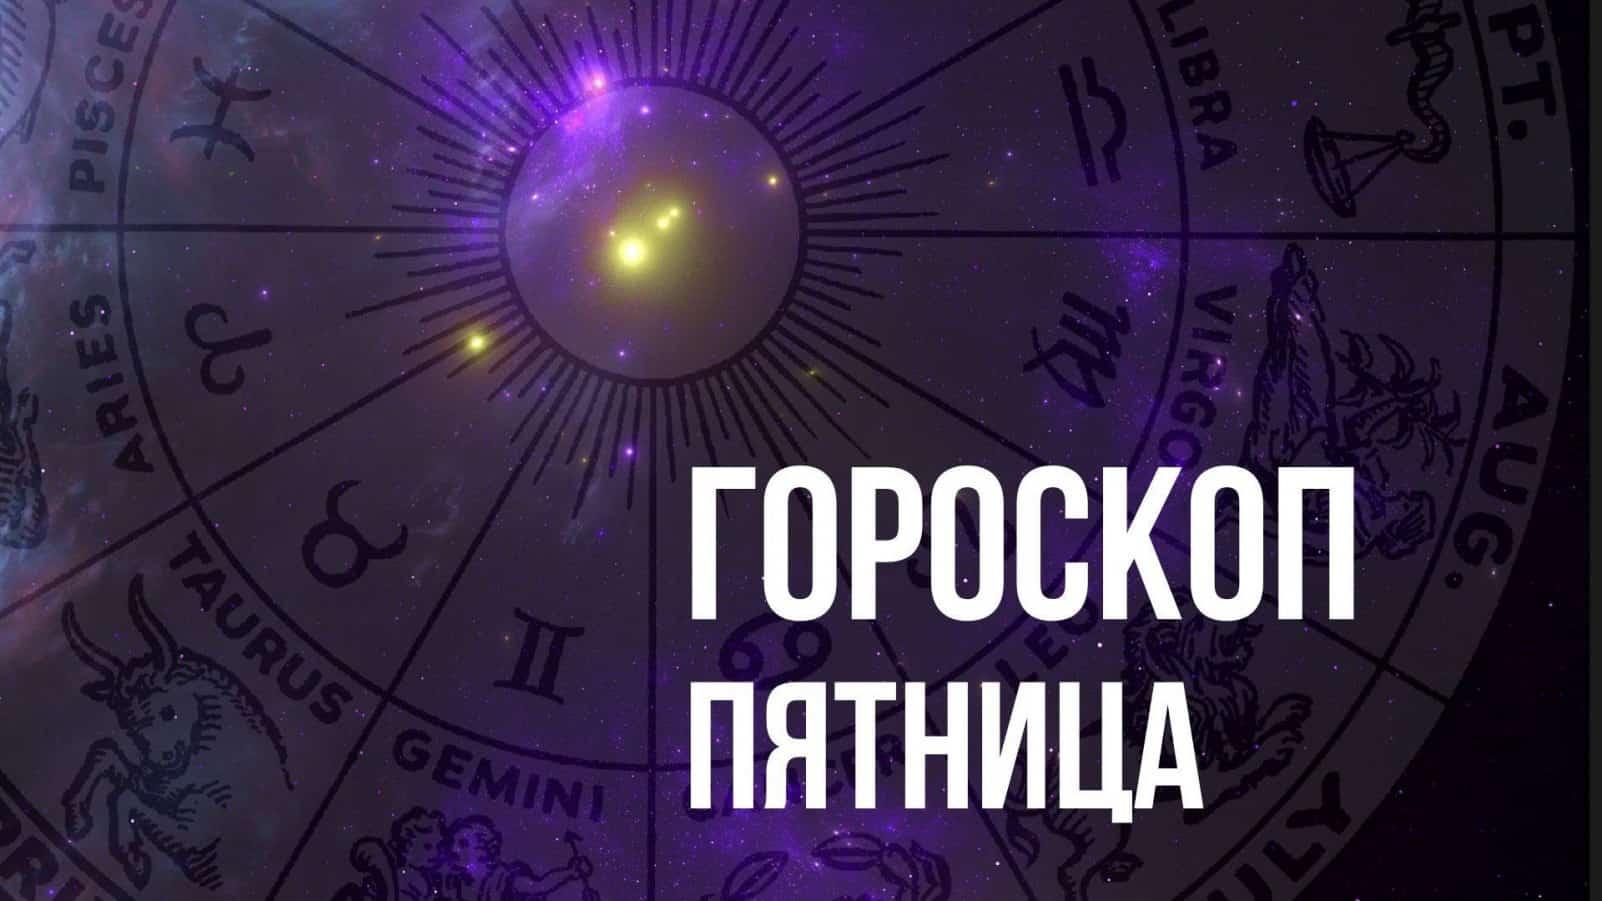 Гороскоп на пятницу 1 октября для каждого знака Зодиака